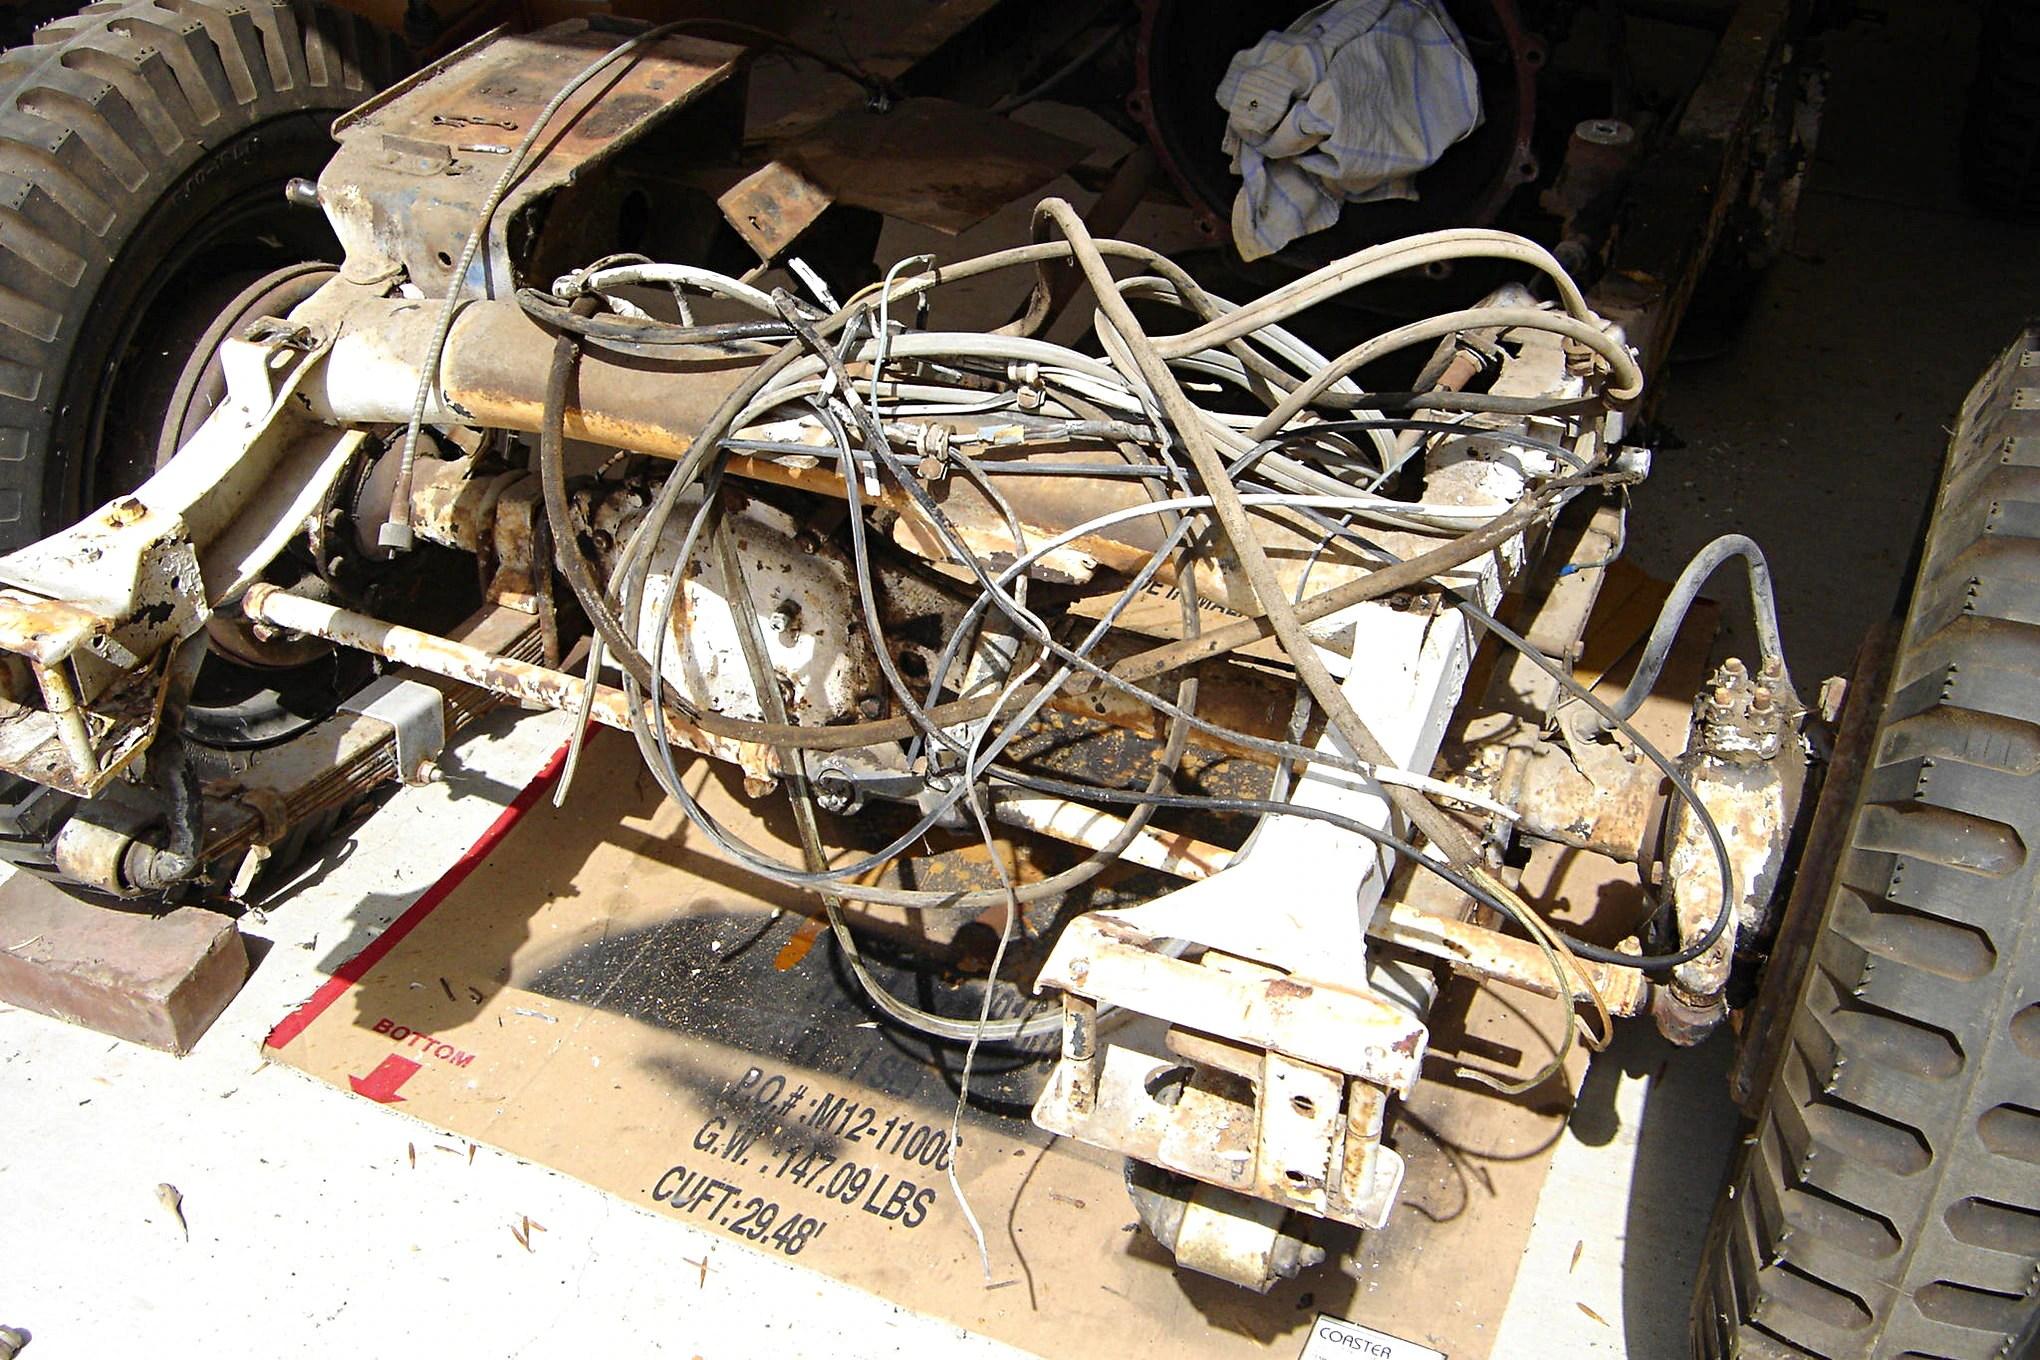 medium resolution of 1946 jeep cj 2a rewiring made easy 1948 willys jeep 1946 willys jeep wiring